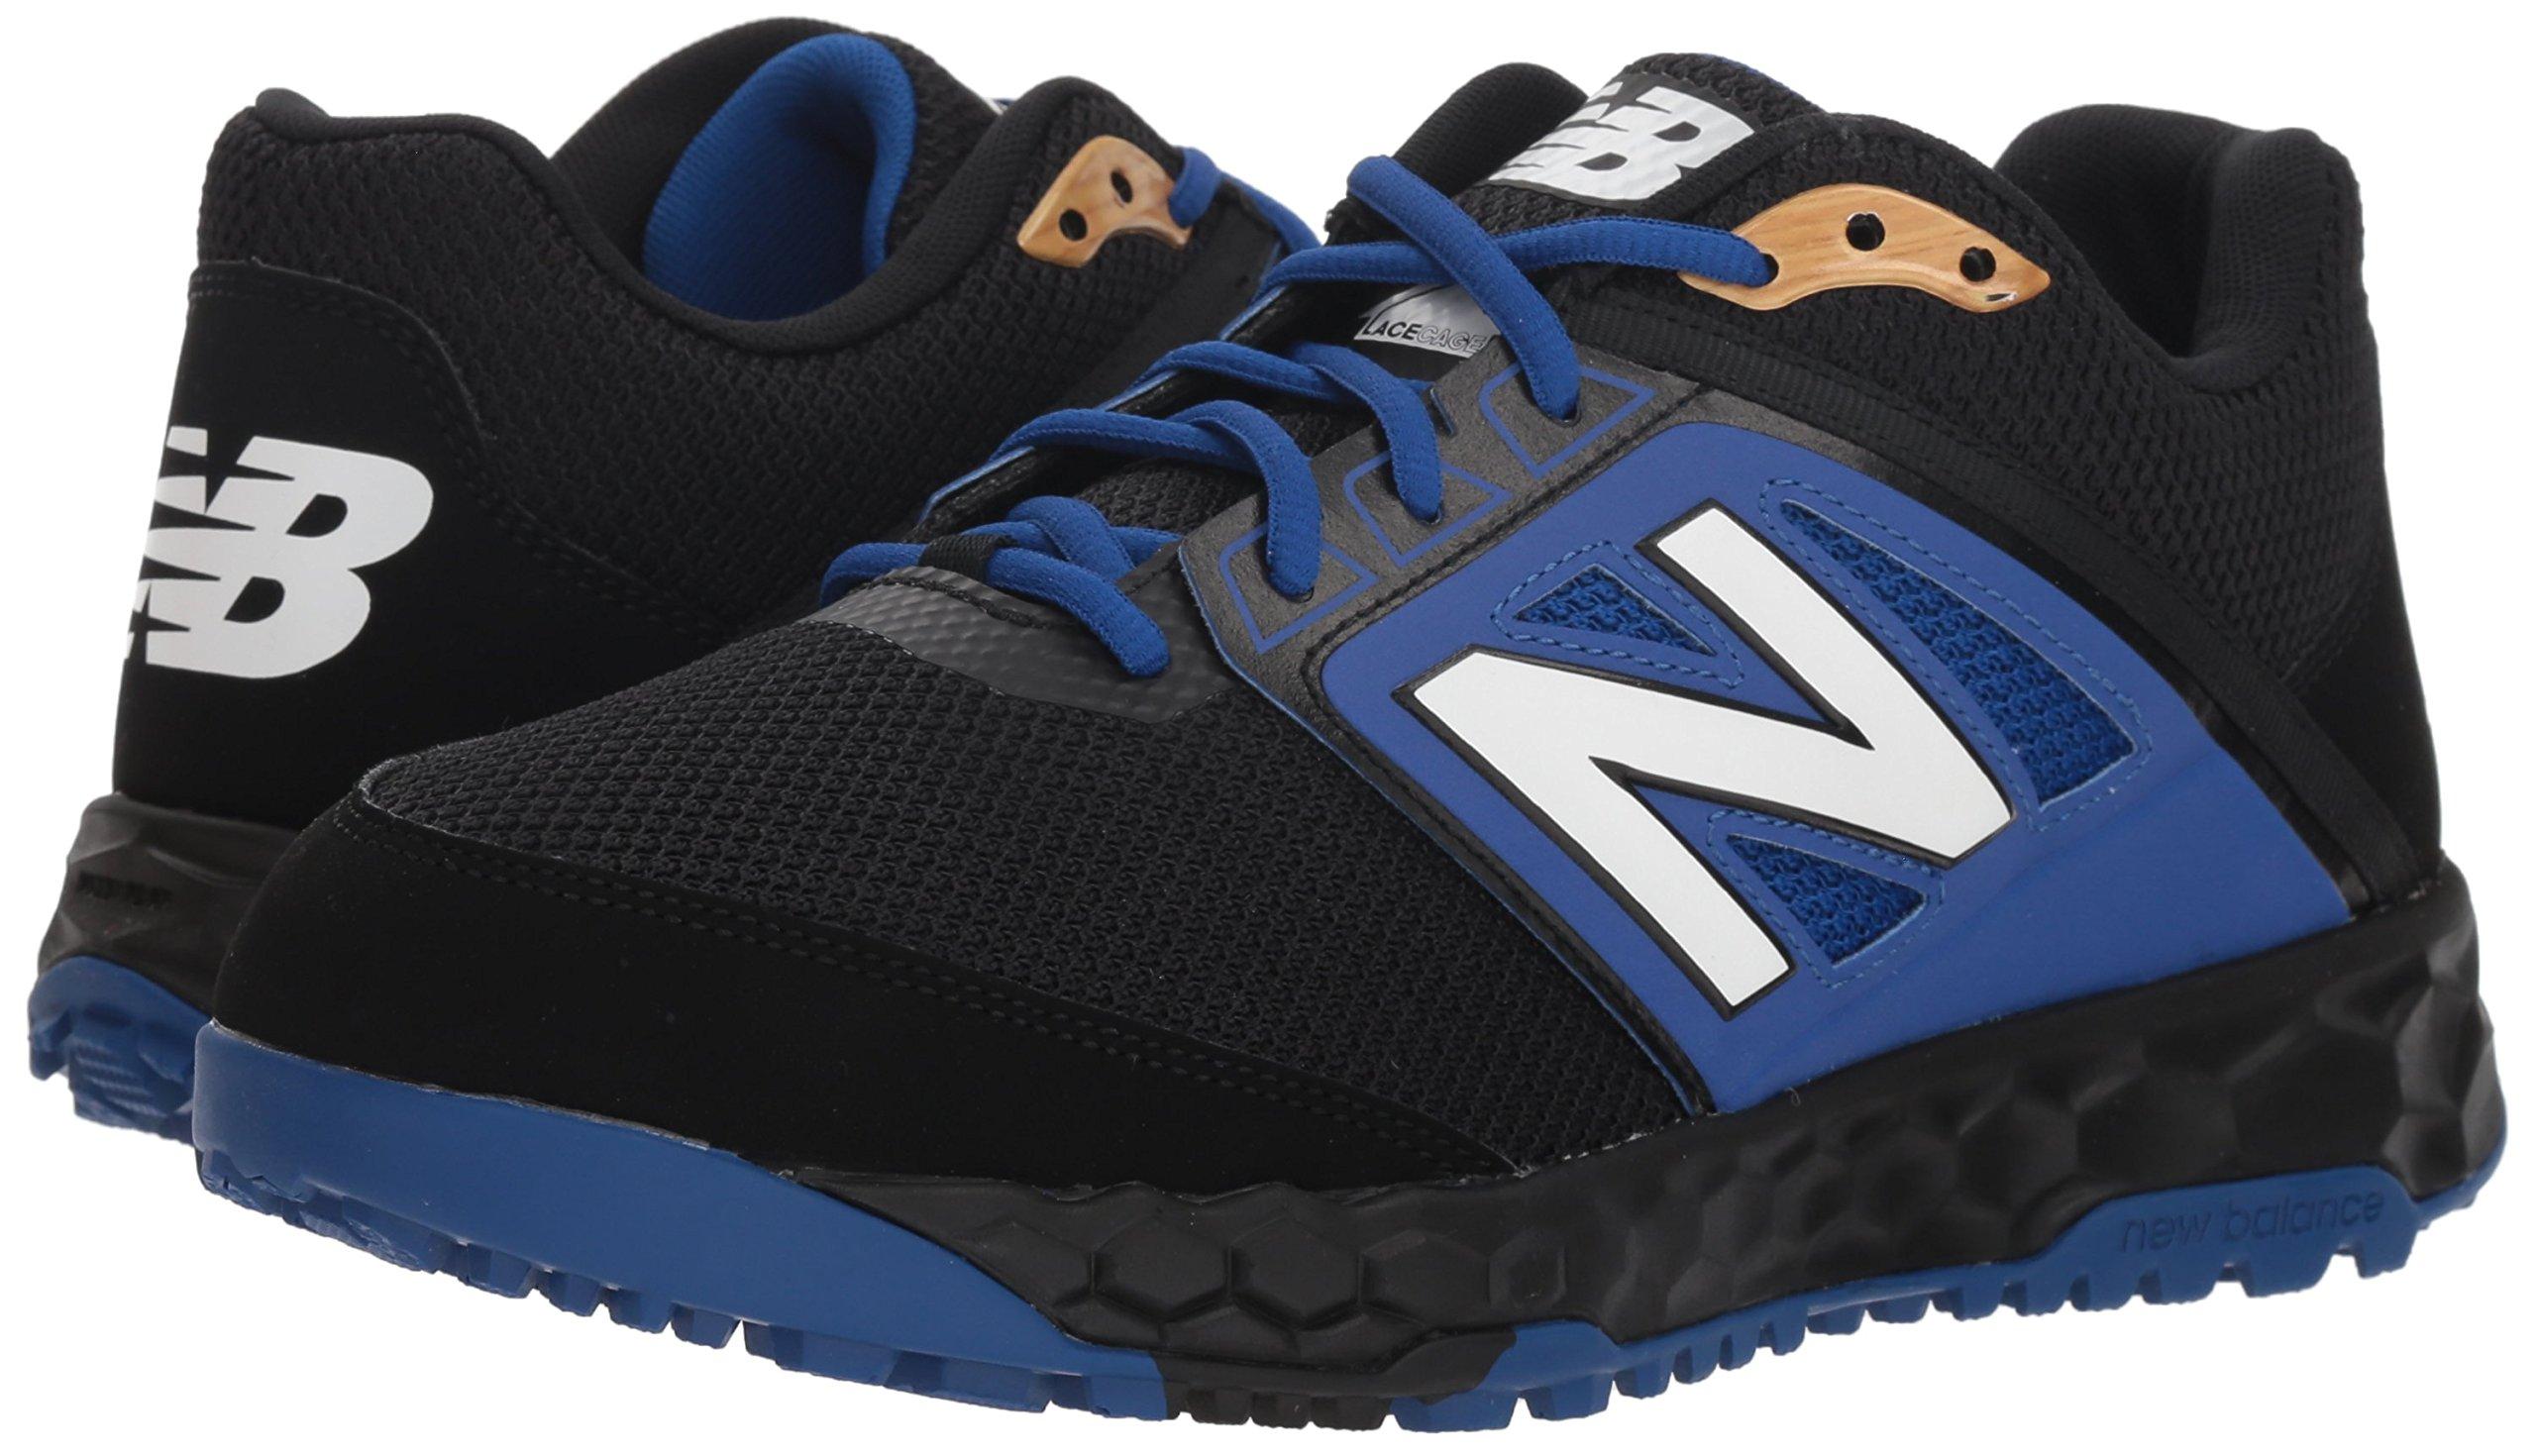 New Balance Men's 3000v4 Turf Baseball Shoe, Black/Blue, 5 D US by New Balance (Image #5)